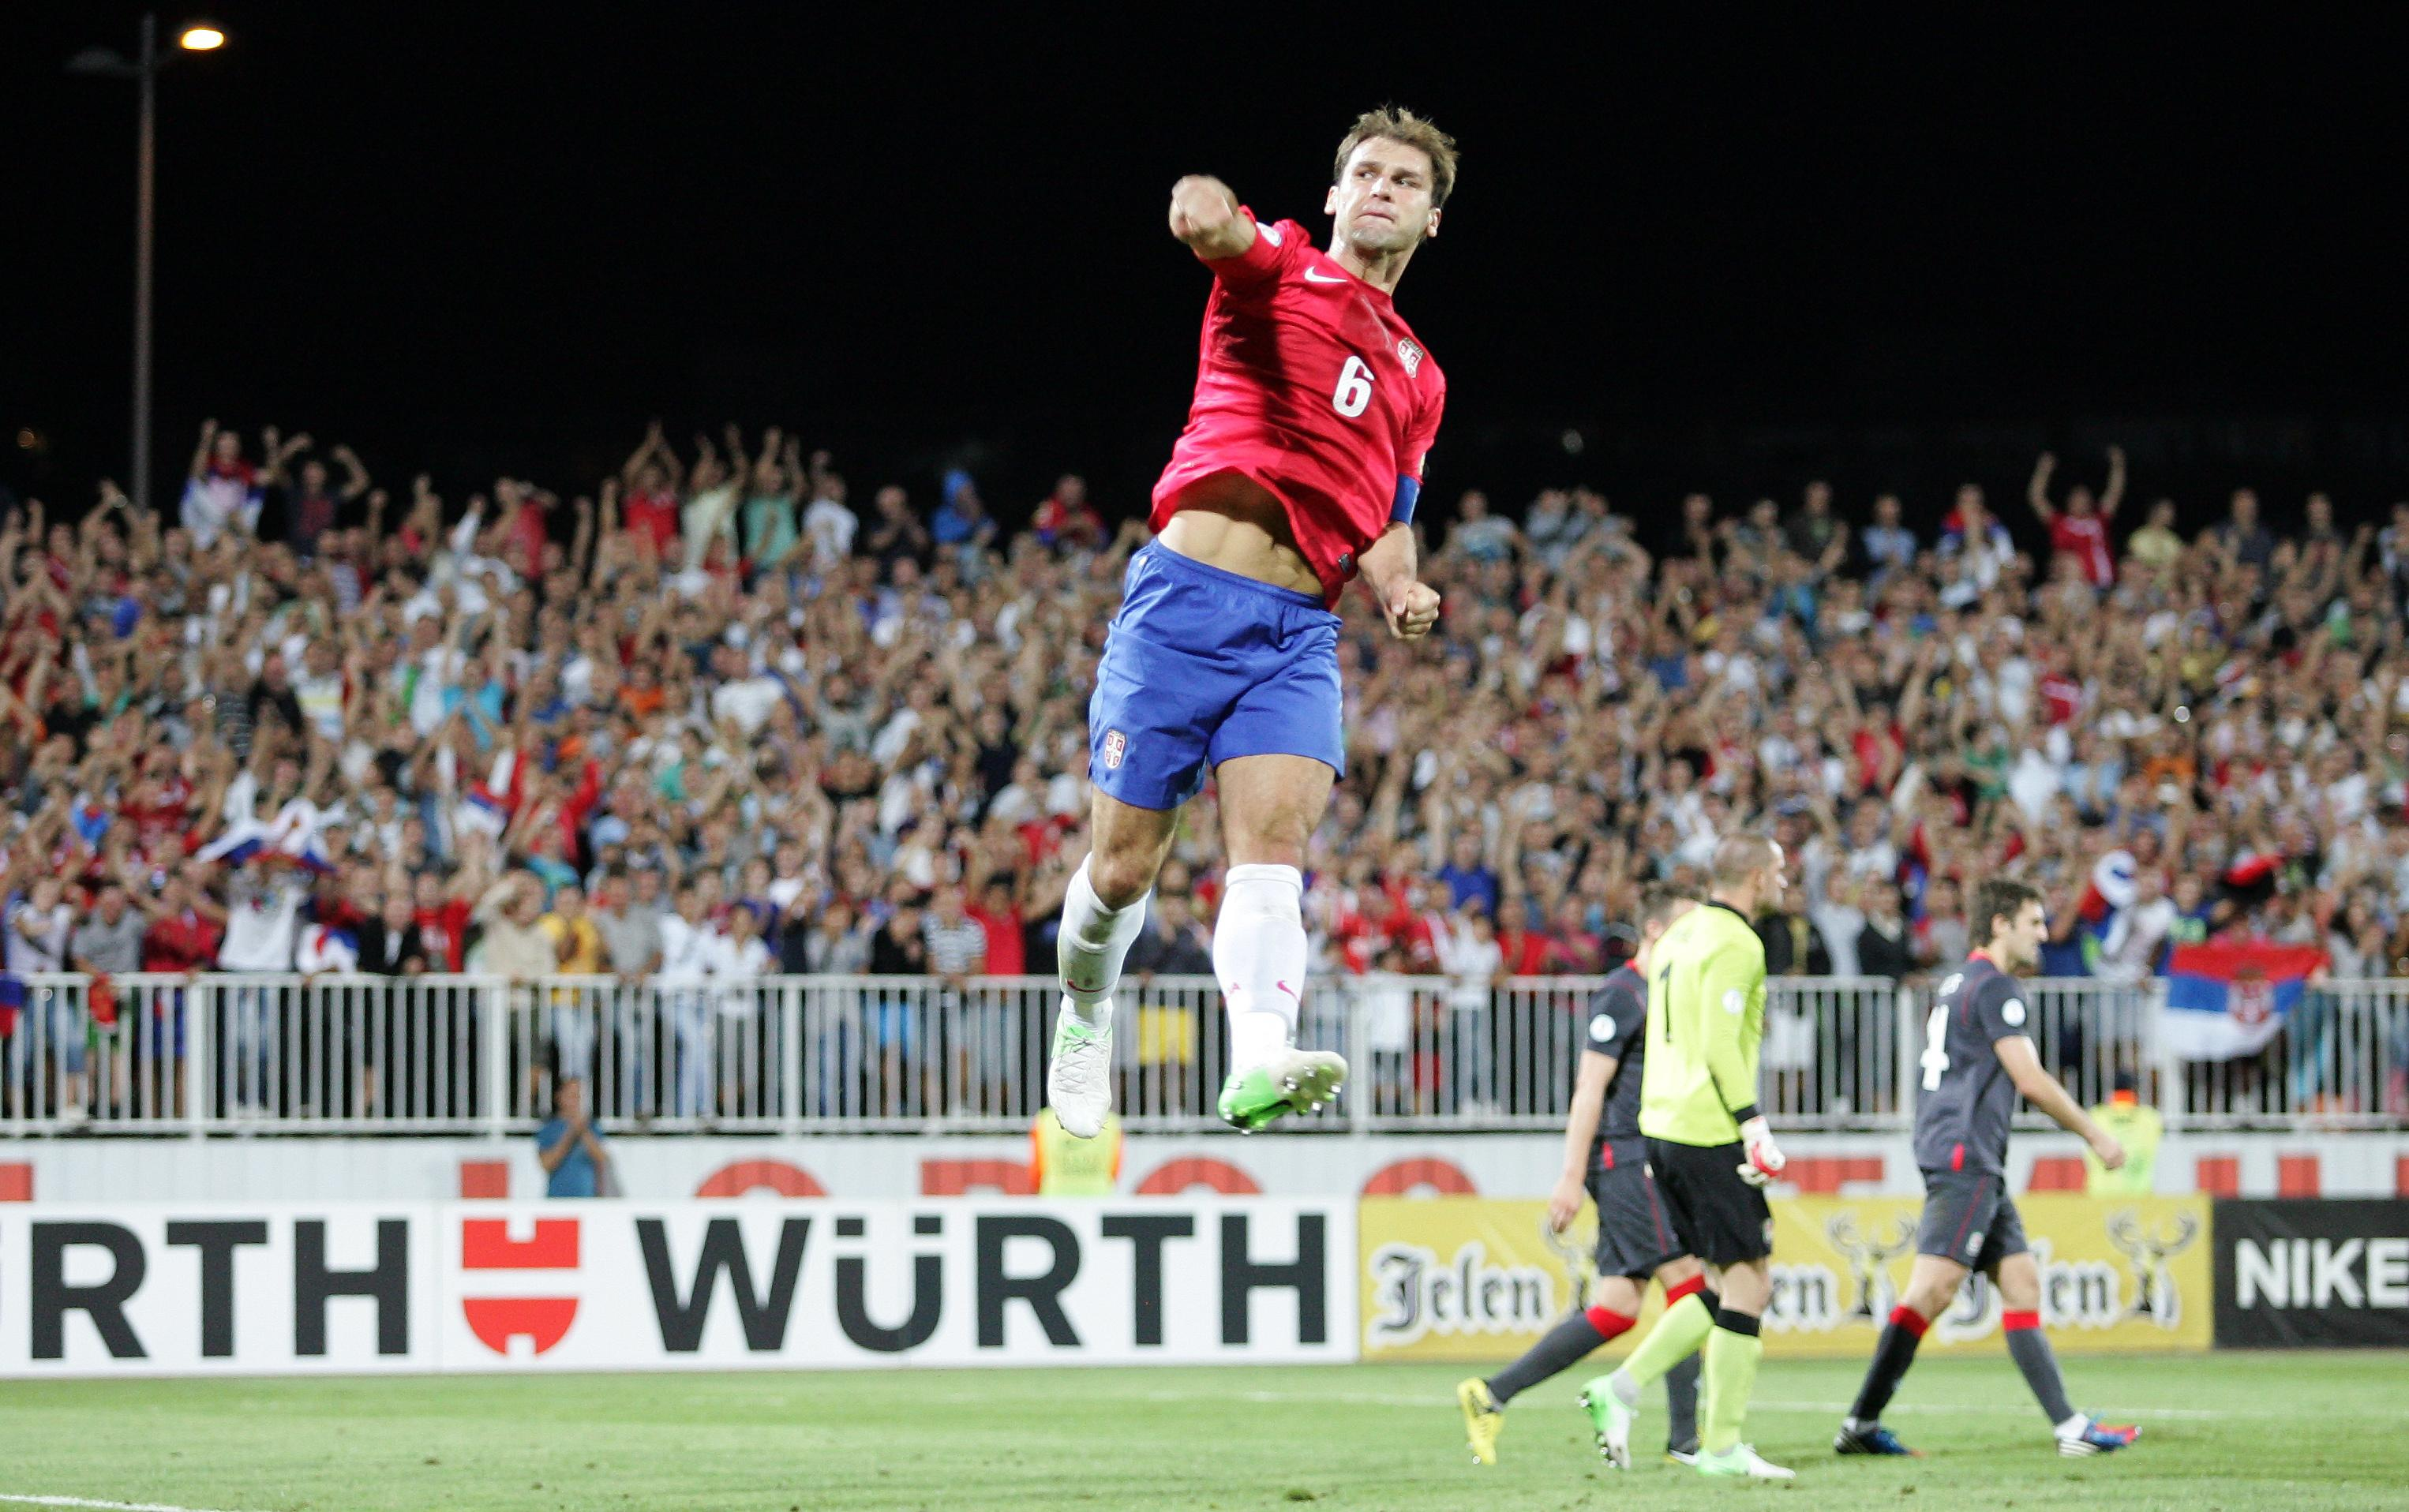 He can still jump bloody high